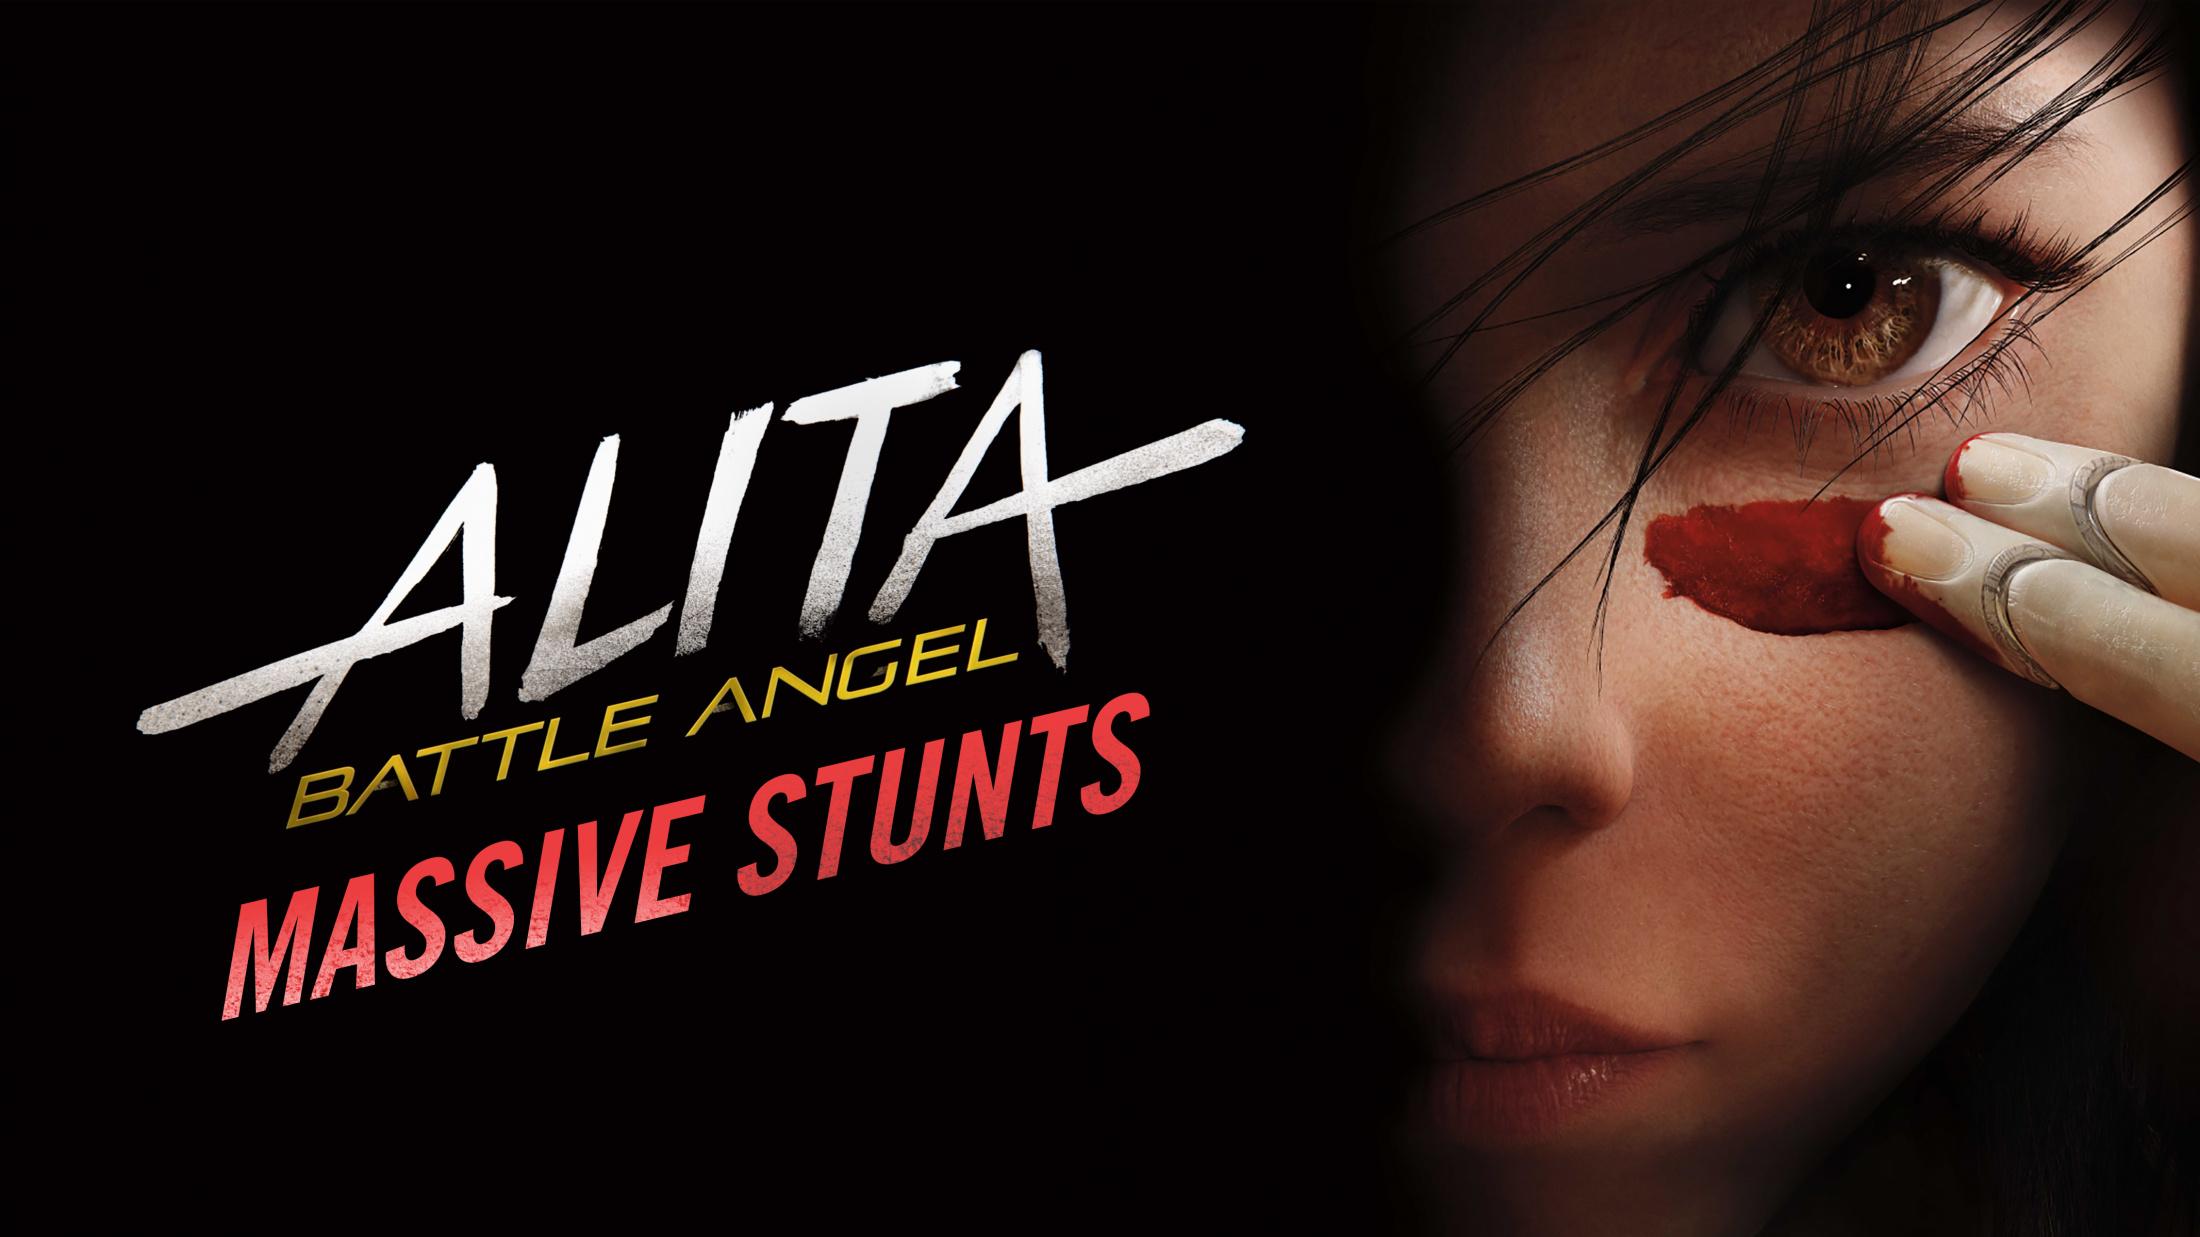 Thumbnail for ALITA BATTLE ANGEL MASSIVE STUNTS